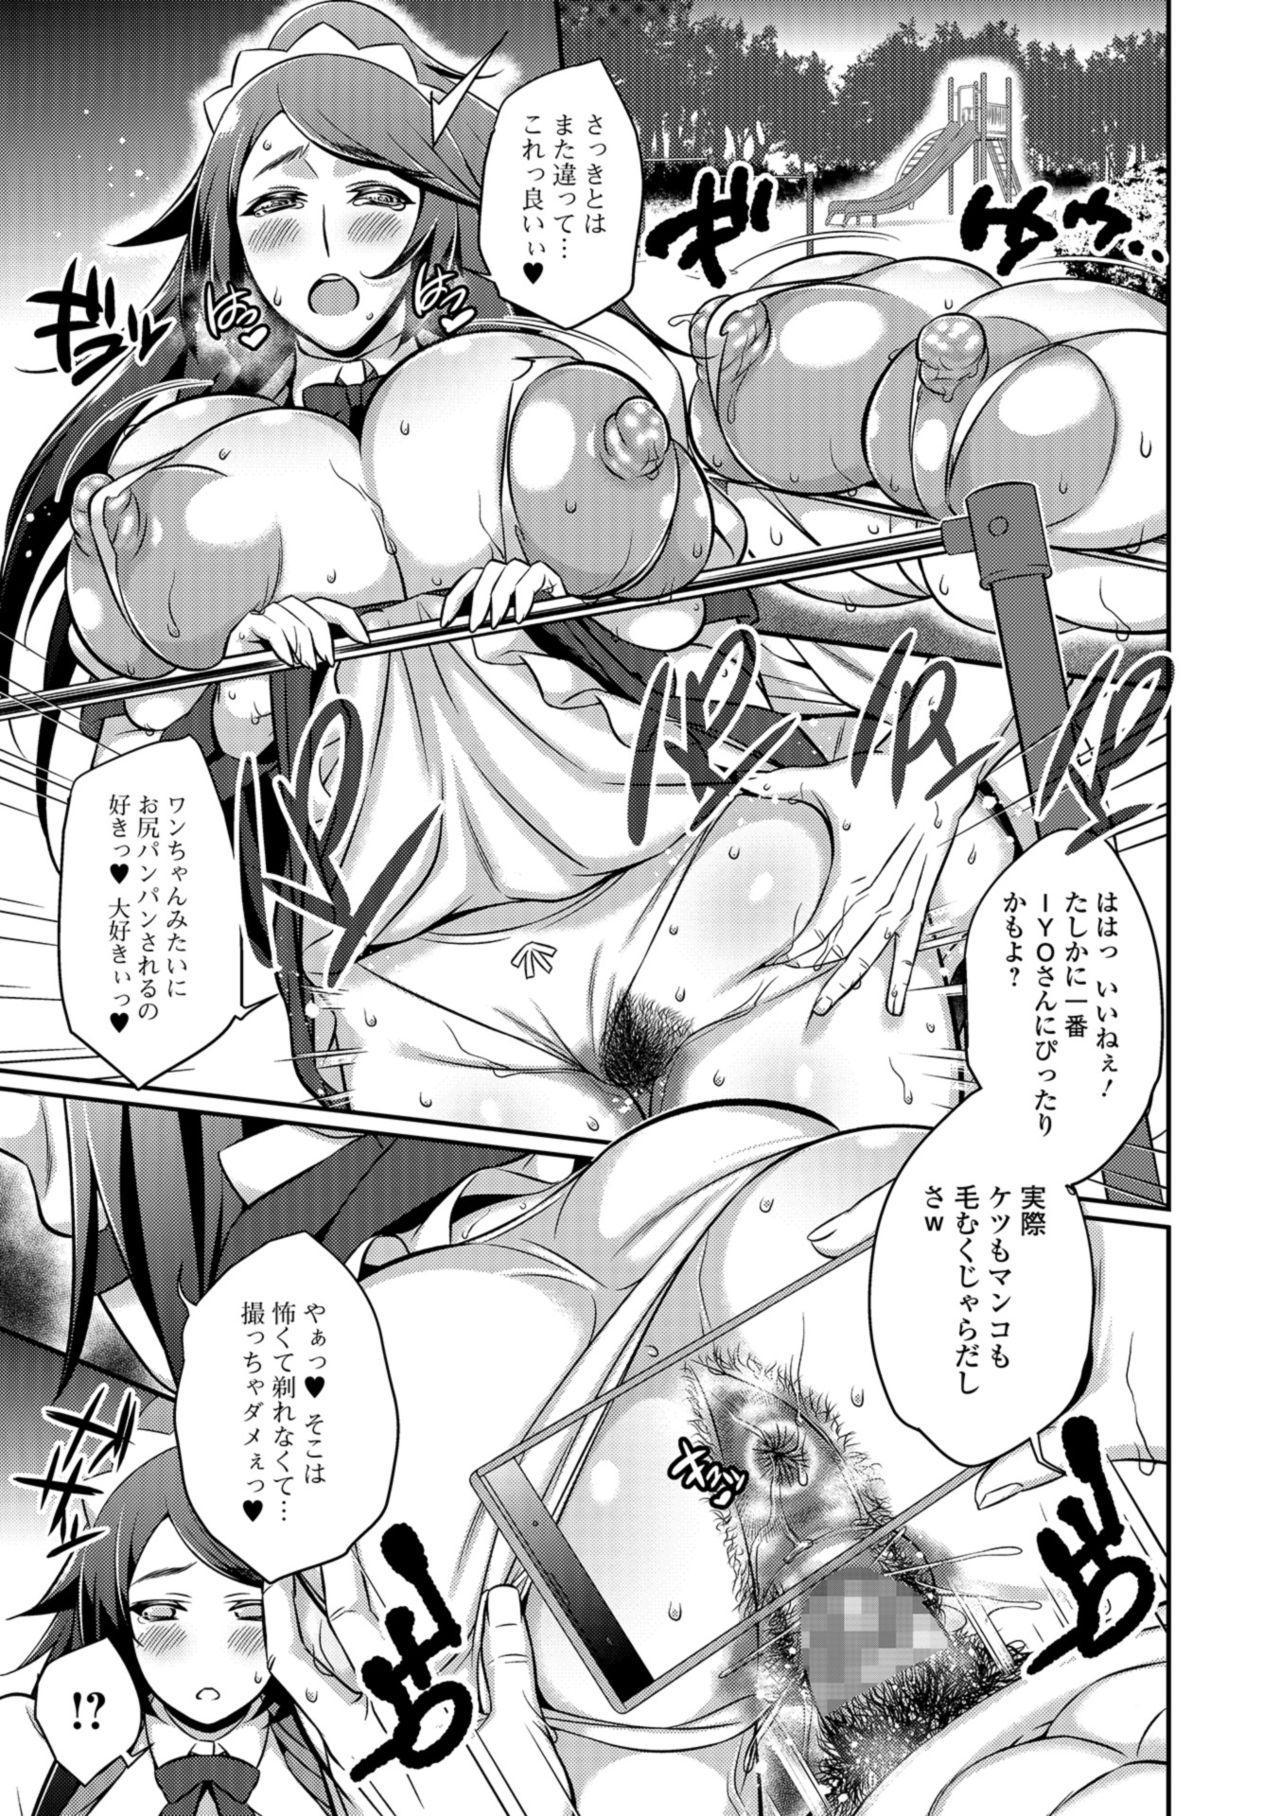 COMIC Shigekiteki SQUIRT!! Vol. 09 228